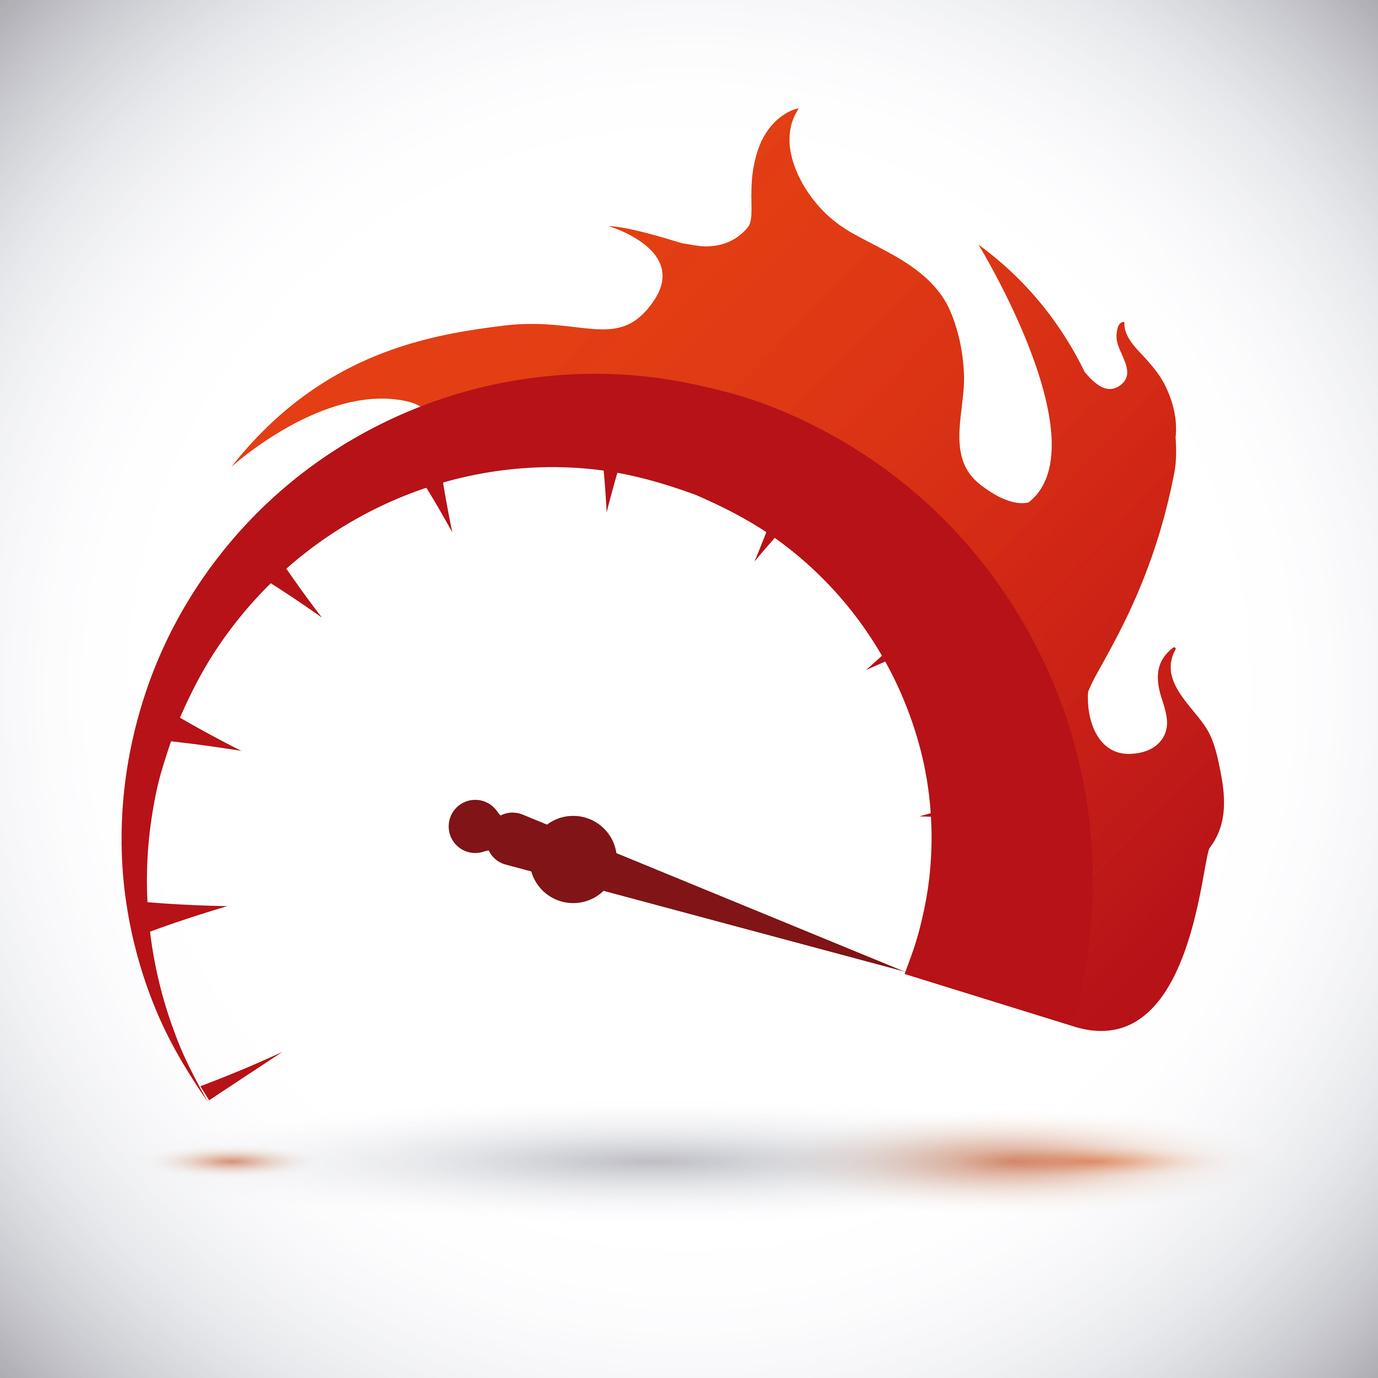 Speed design over white background, vector illustration.